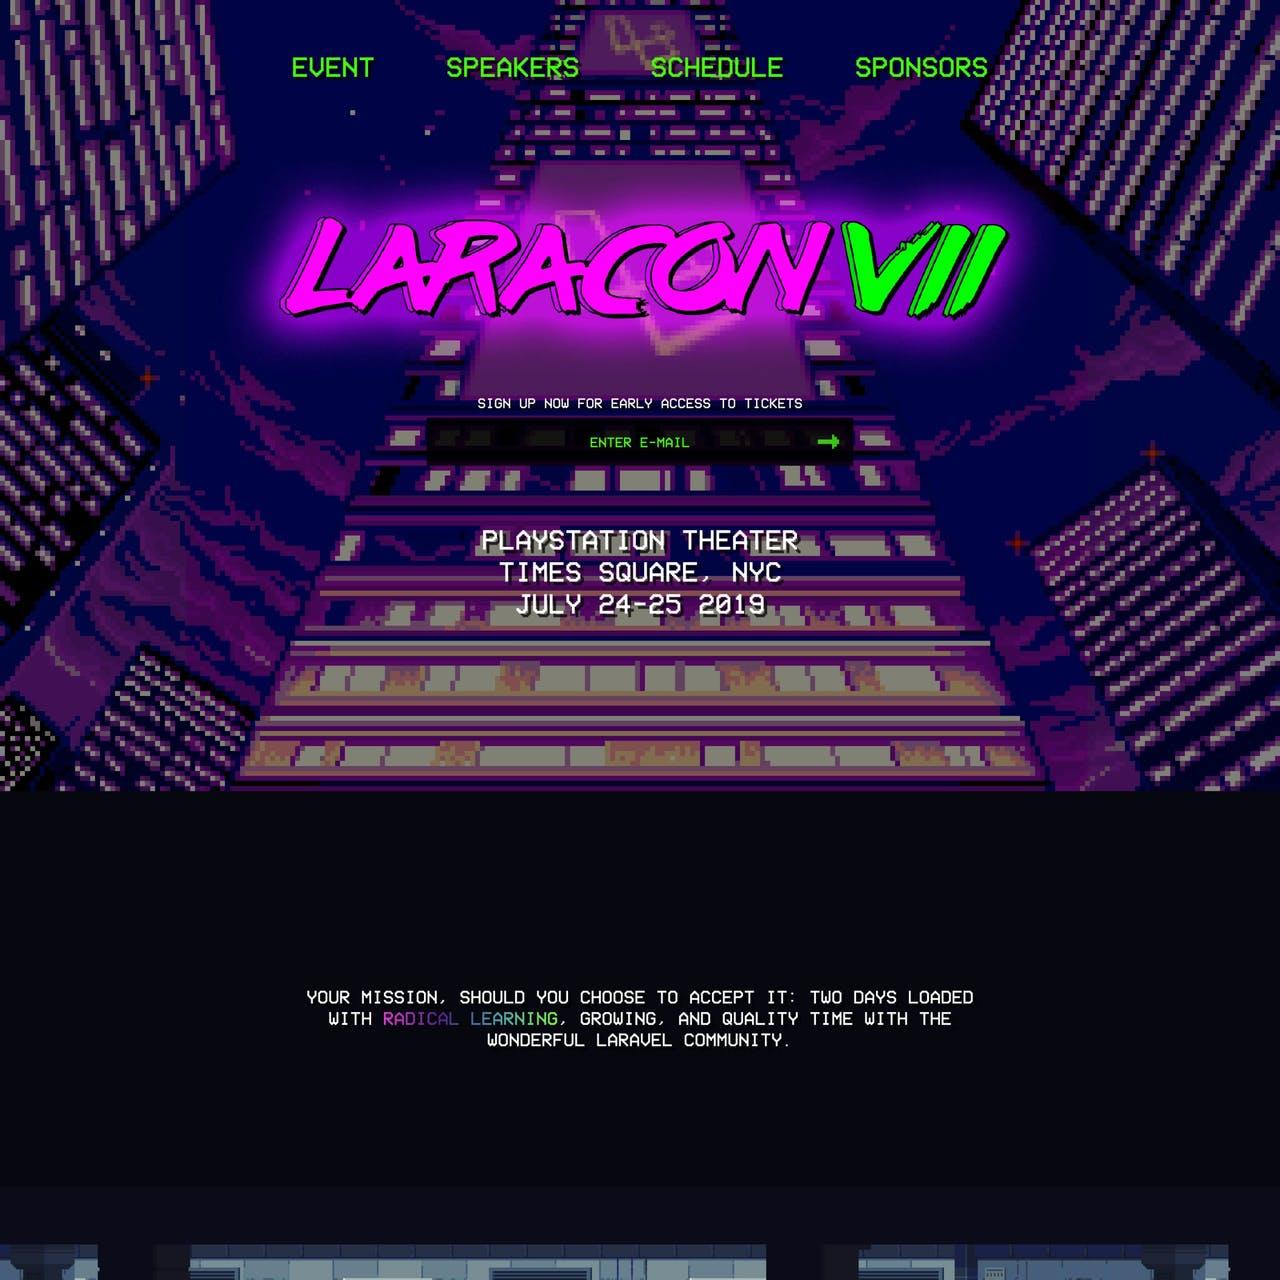 Laracon VII Website Screenshot